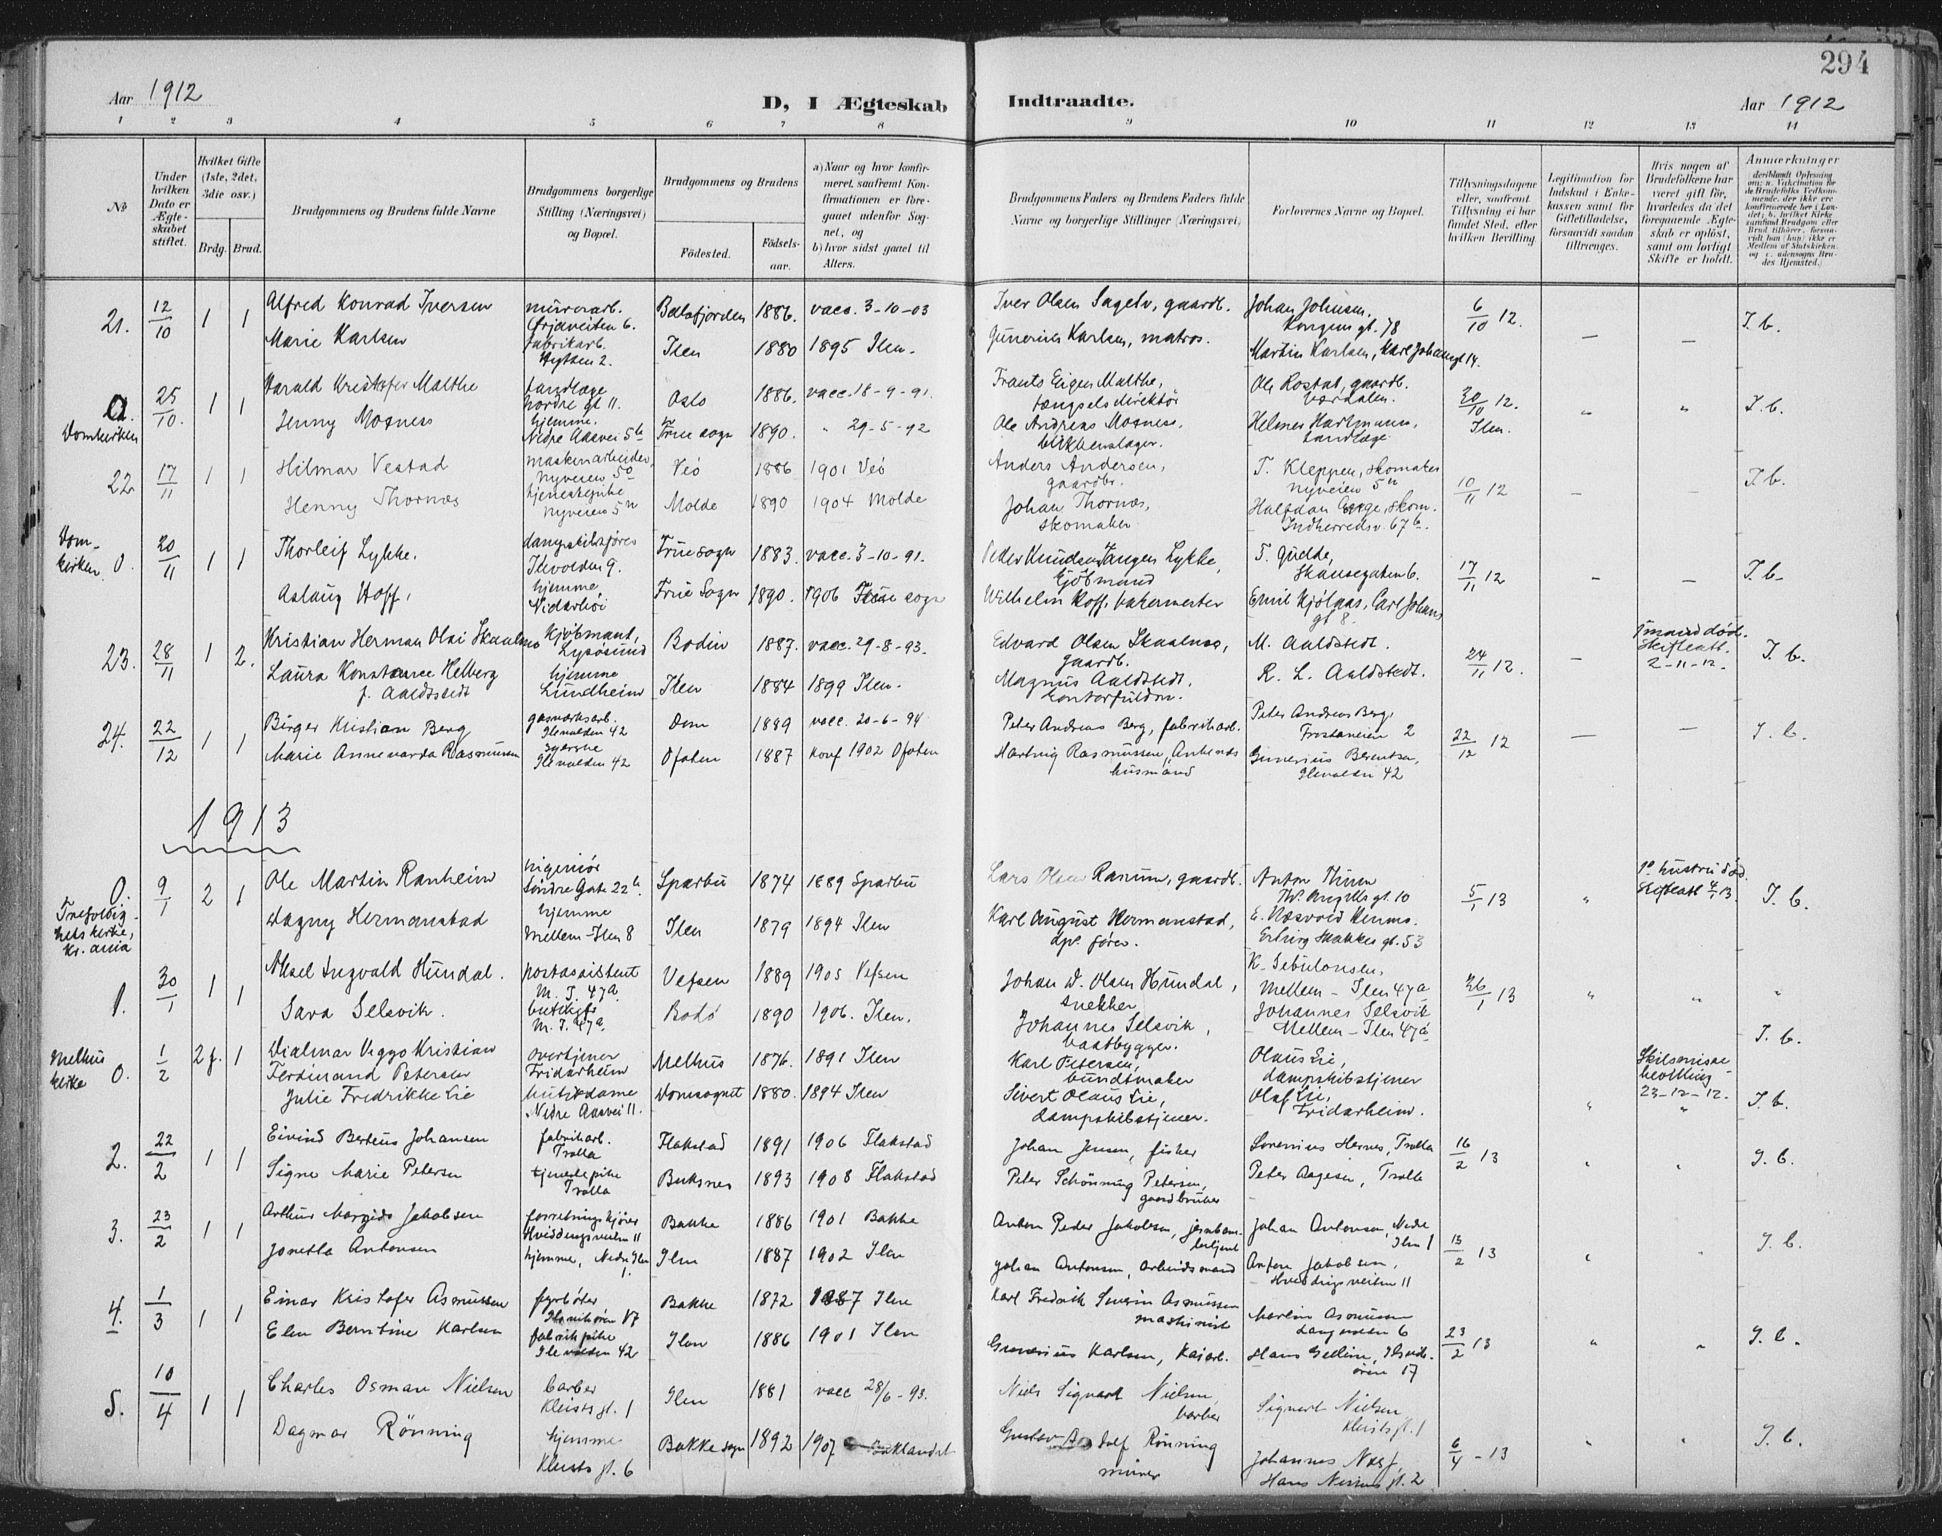 SAT, Ministerialprotokoller, klokkerbøker og fødselsregistre - Sør-Trøndelag, 603/L0167: Parish register (official) no. 603A06, 1896-1932, p. 294